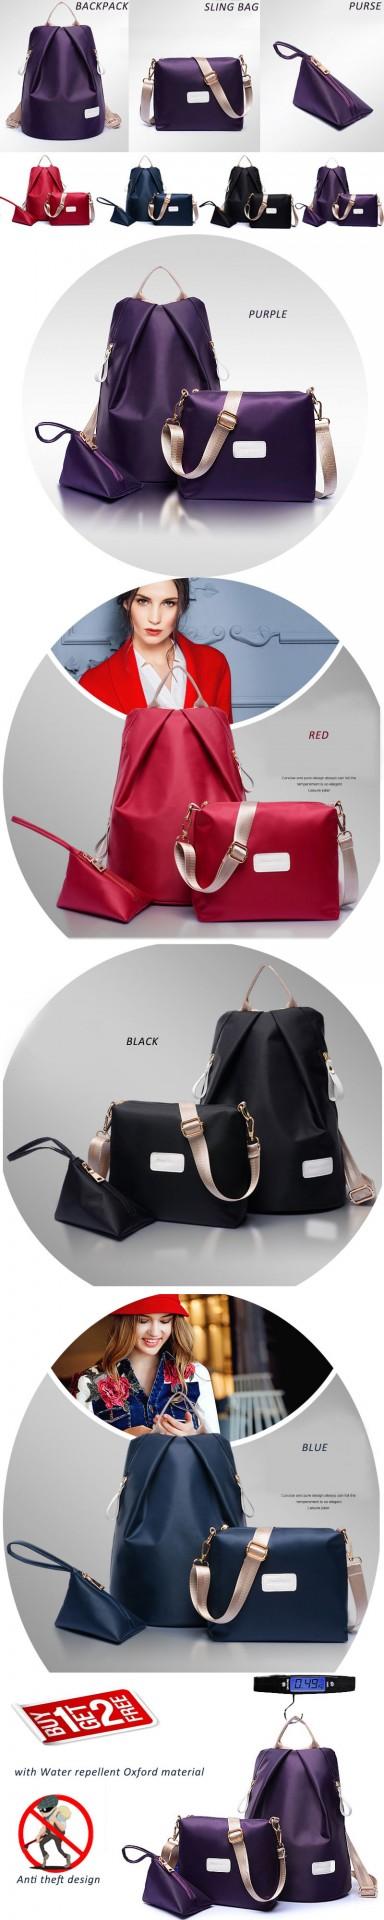 Anti Theft Travel Cosmetic Korean Backpack Handbag Sling